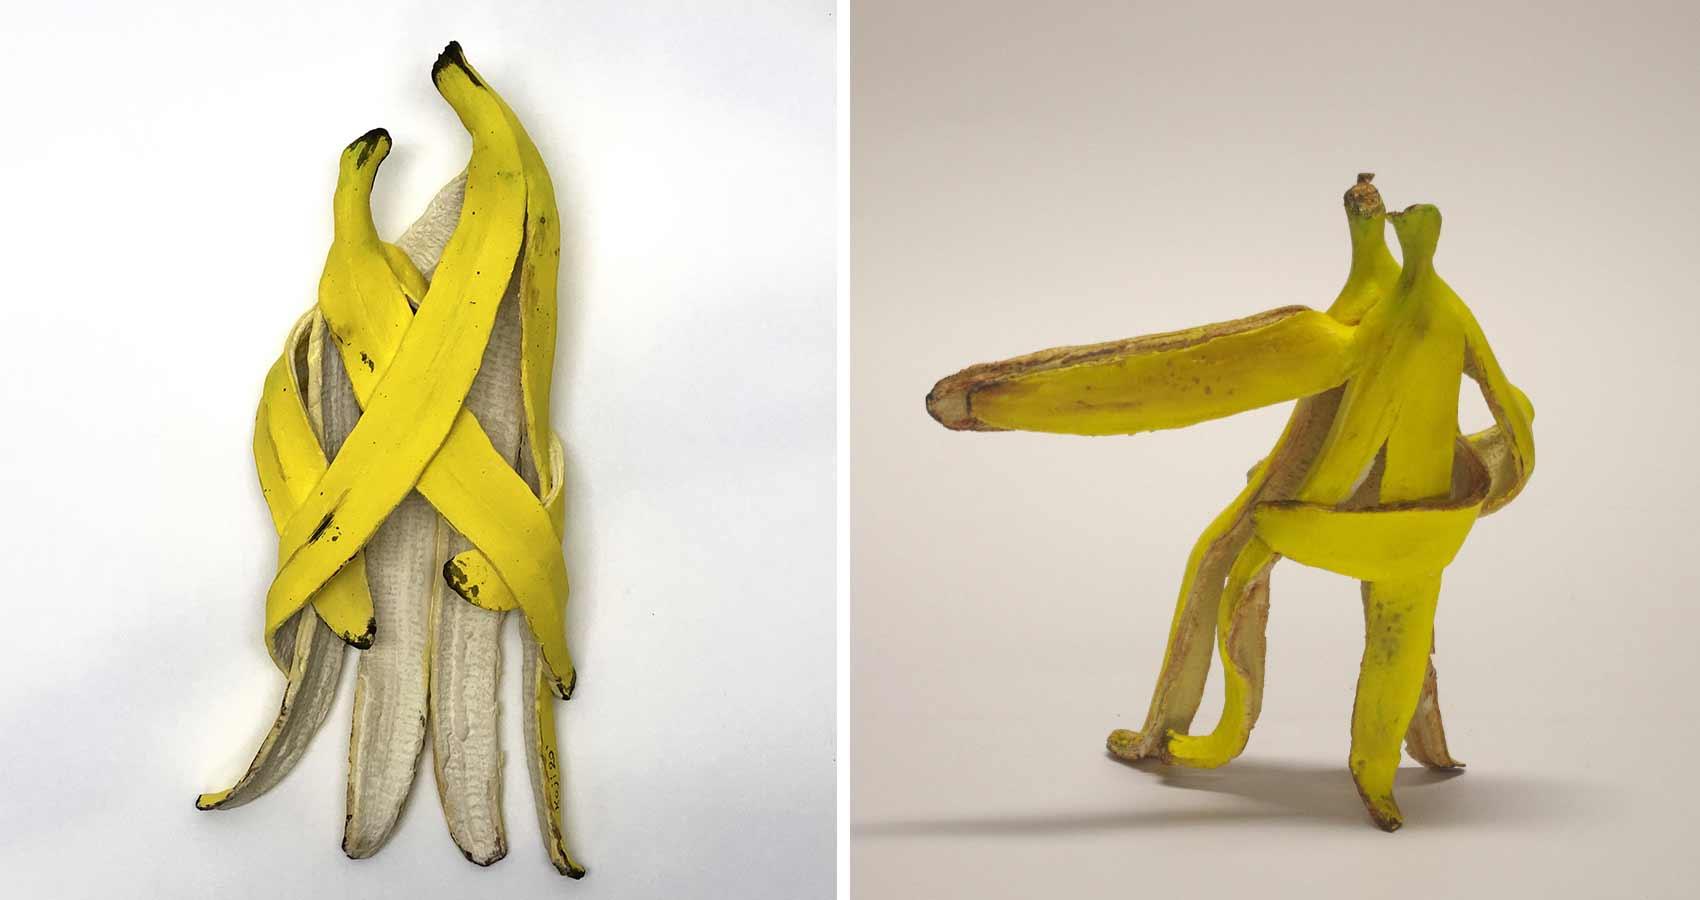 Bananen-Skulpturen von Koji Kasatani Koji-Kasatani-bananenskulpturen_05